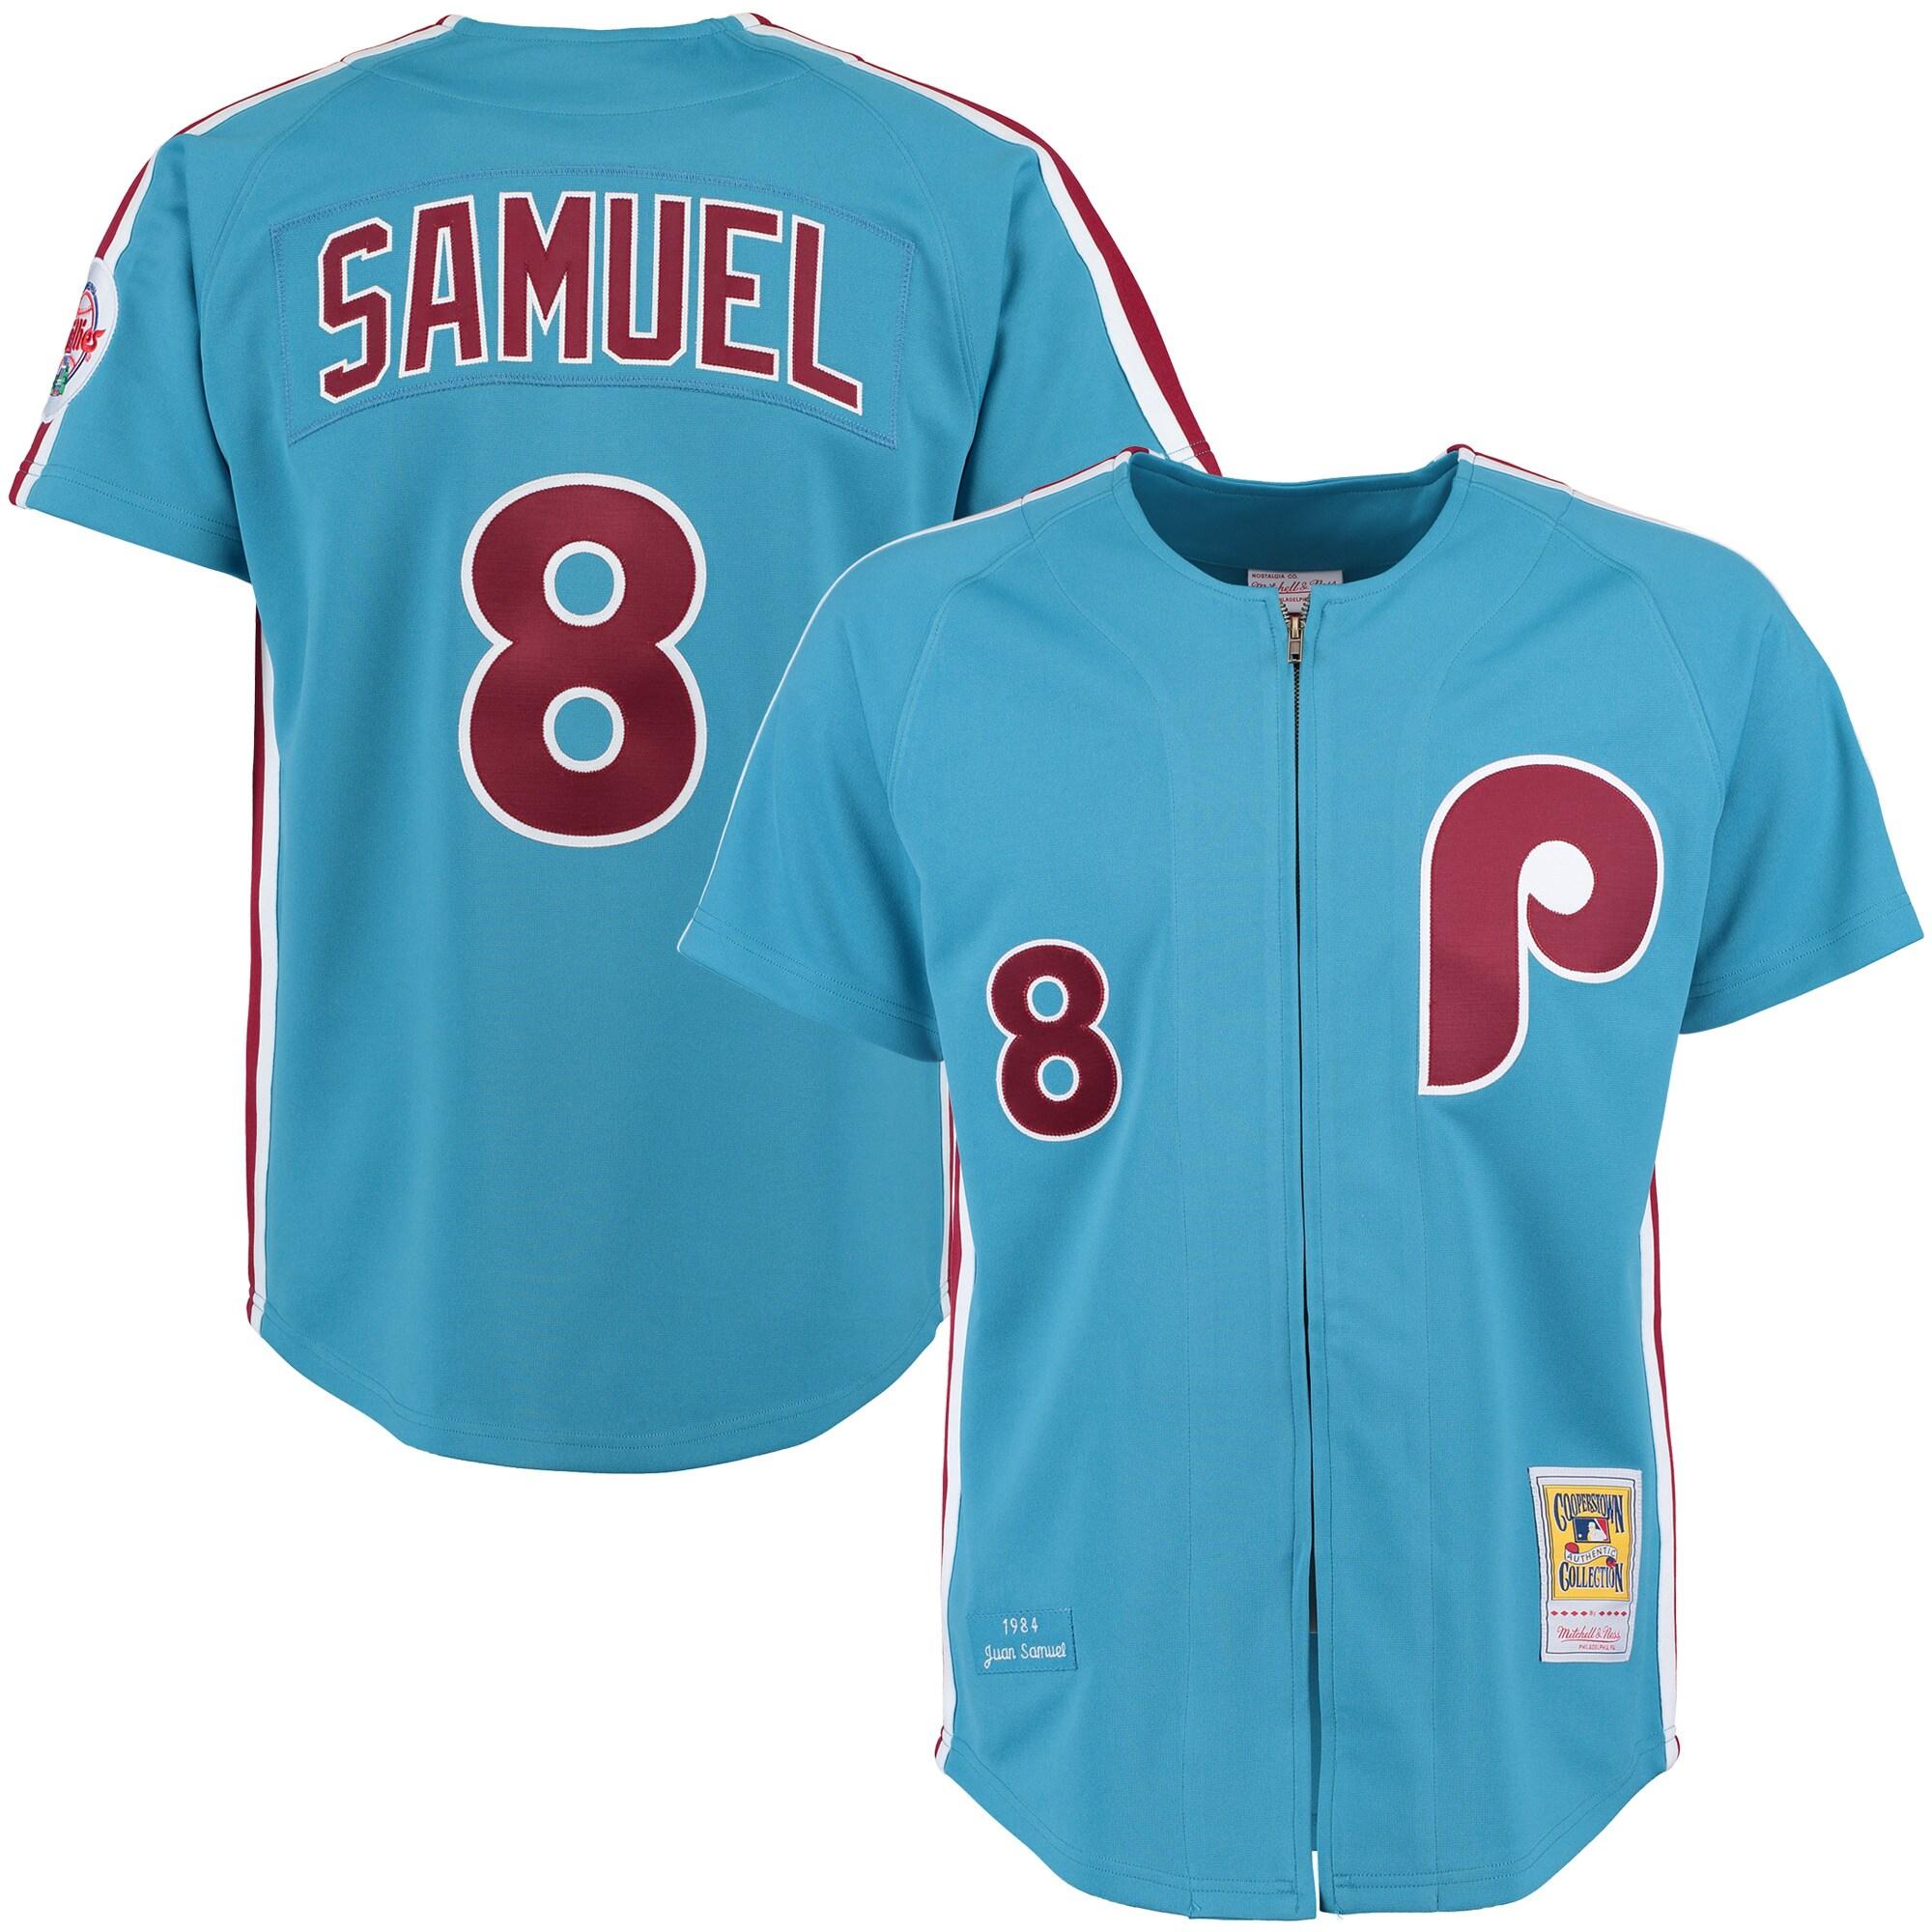 Juan Samuel 1983 Philadelphia Phillies Mitchell & Ness Authentic Throwback Jersey - Light Blue